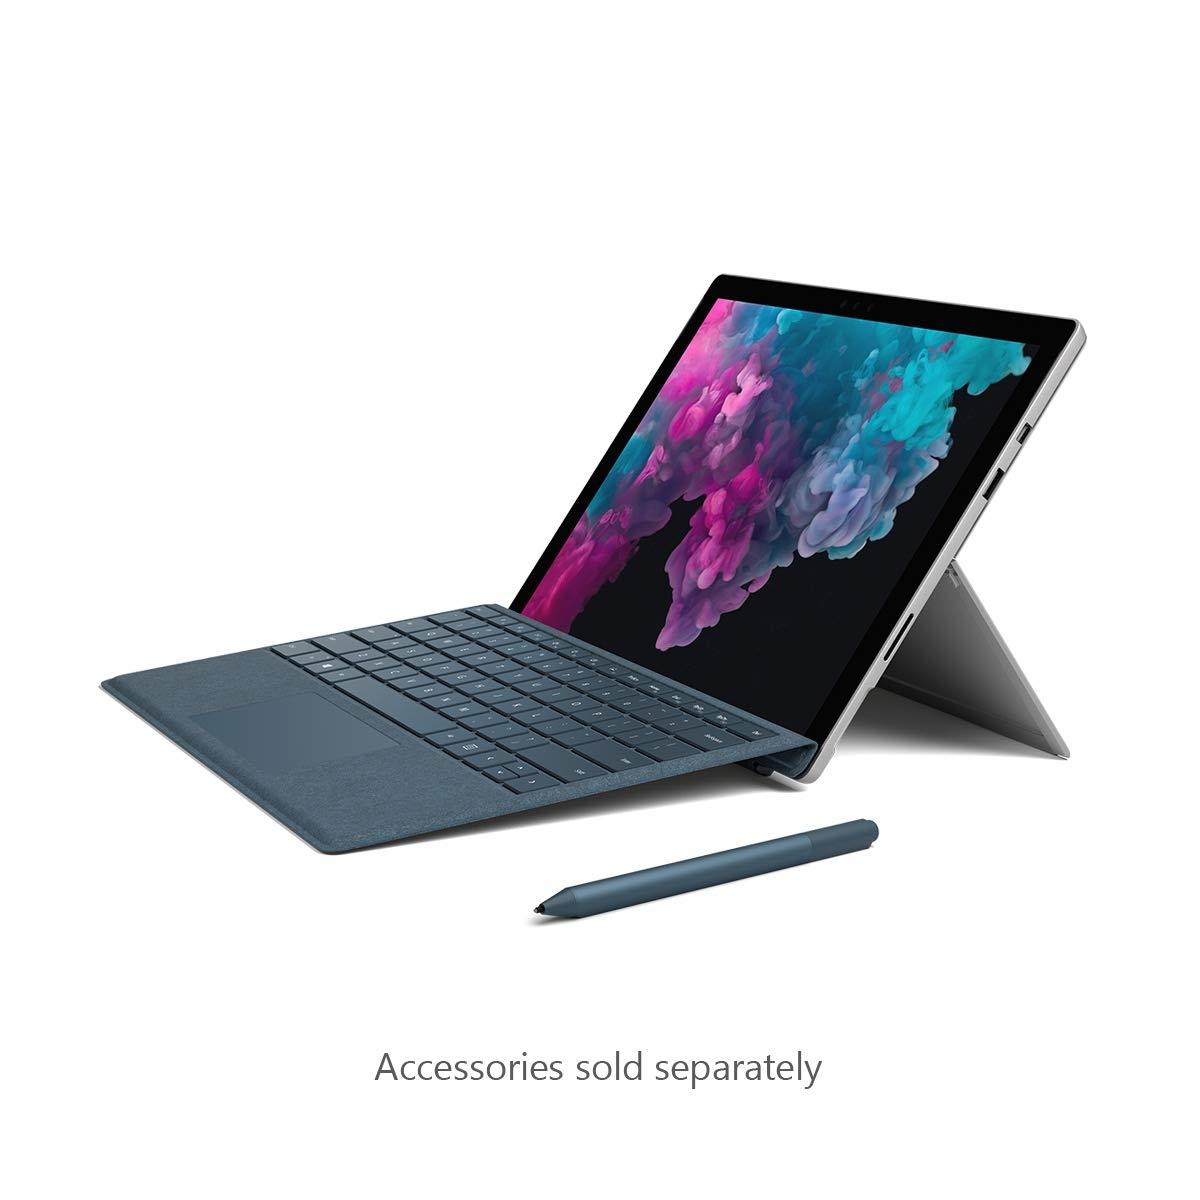 Microsoft Surface Pro 6 (Intel Core i5, 8GB RAM, 128GB) - Newest Version, Platinum by Microsoft